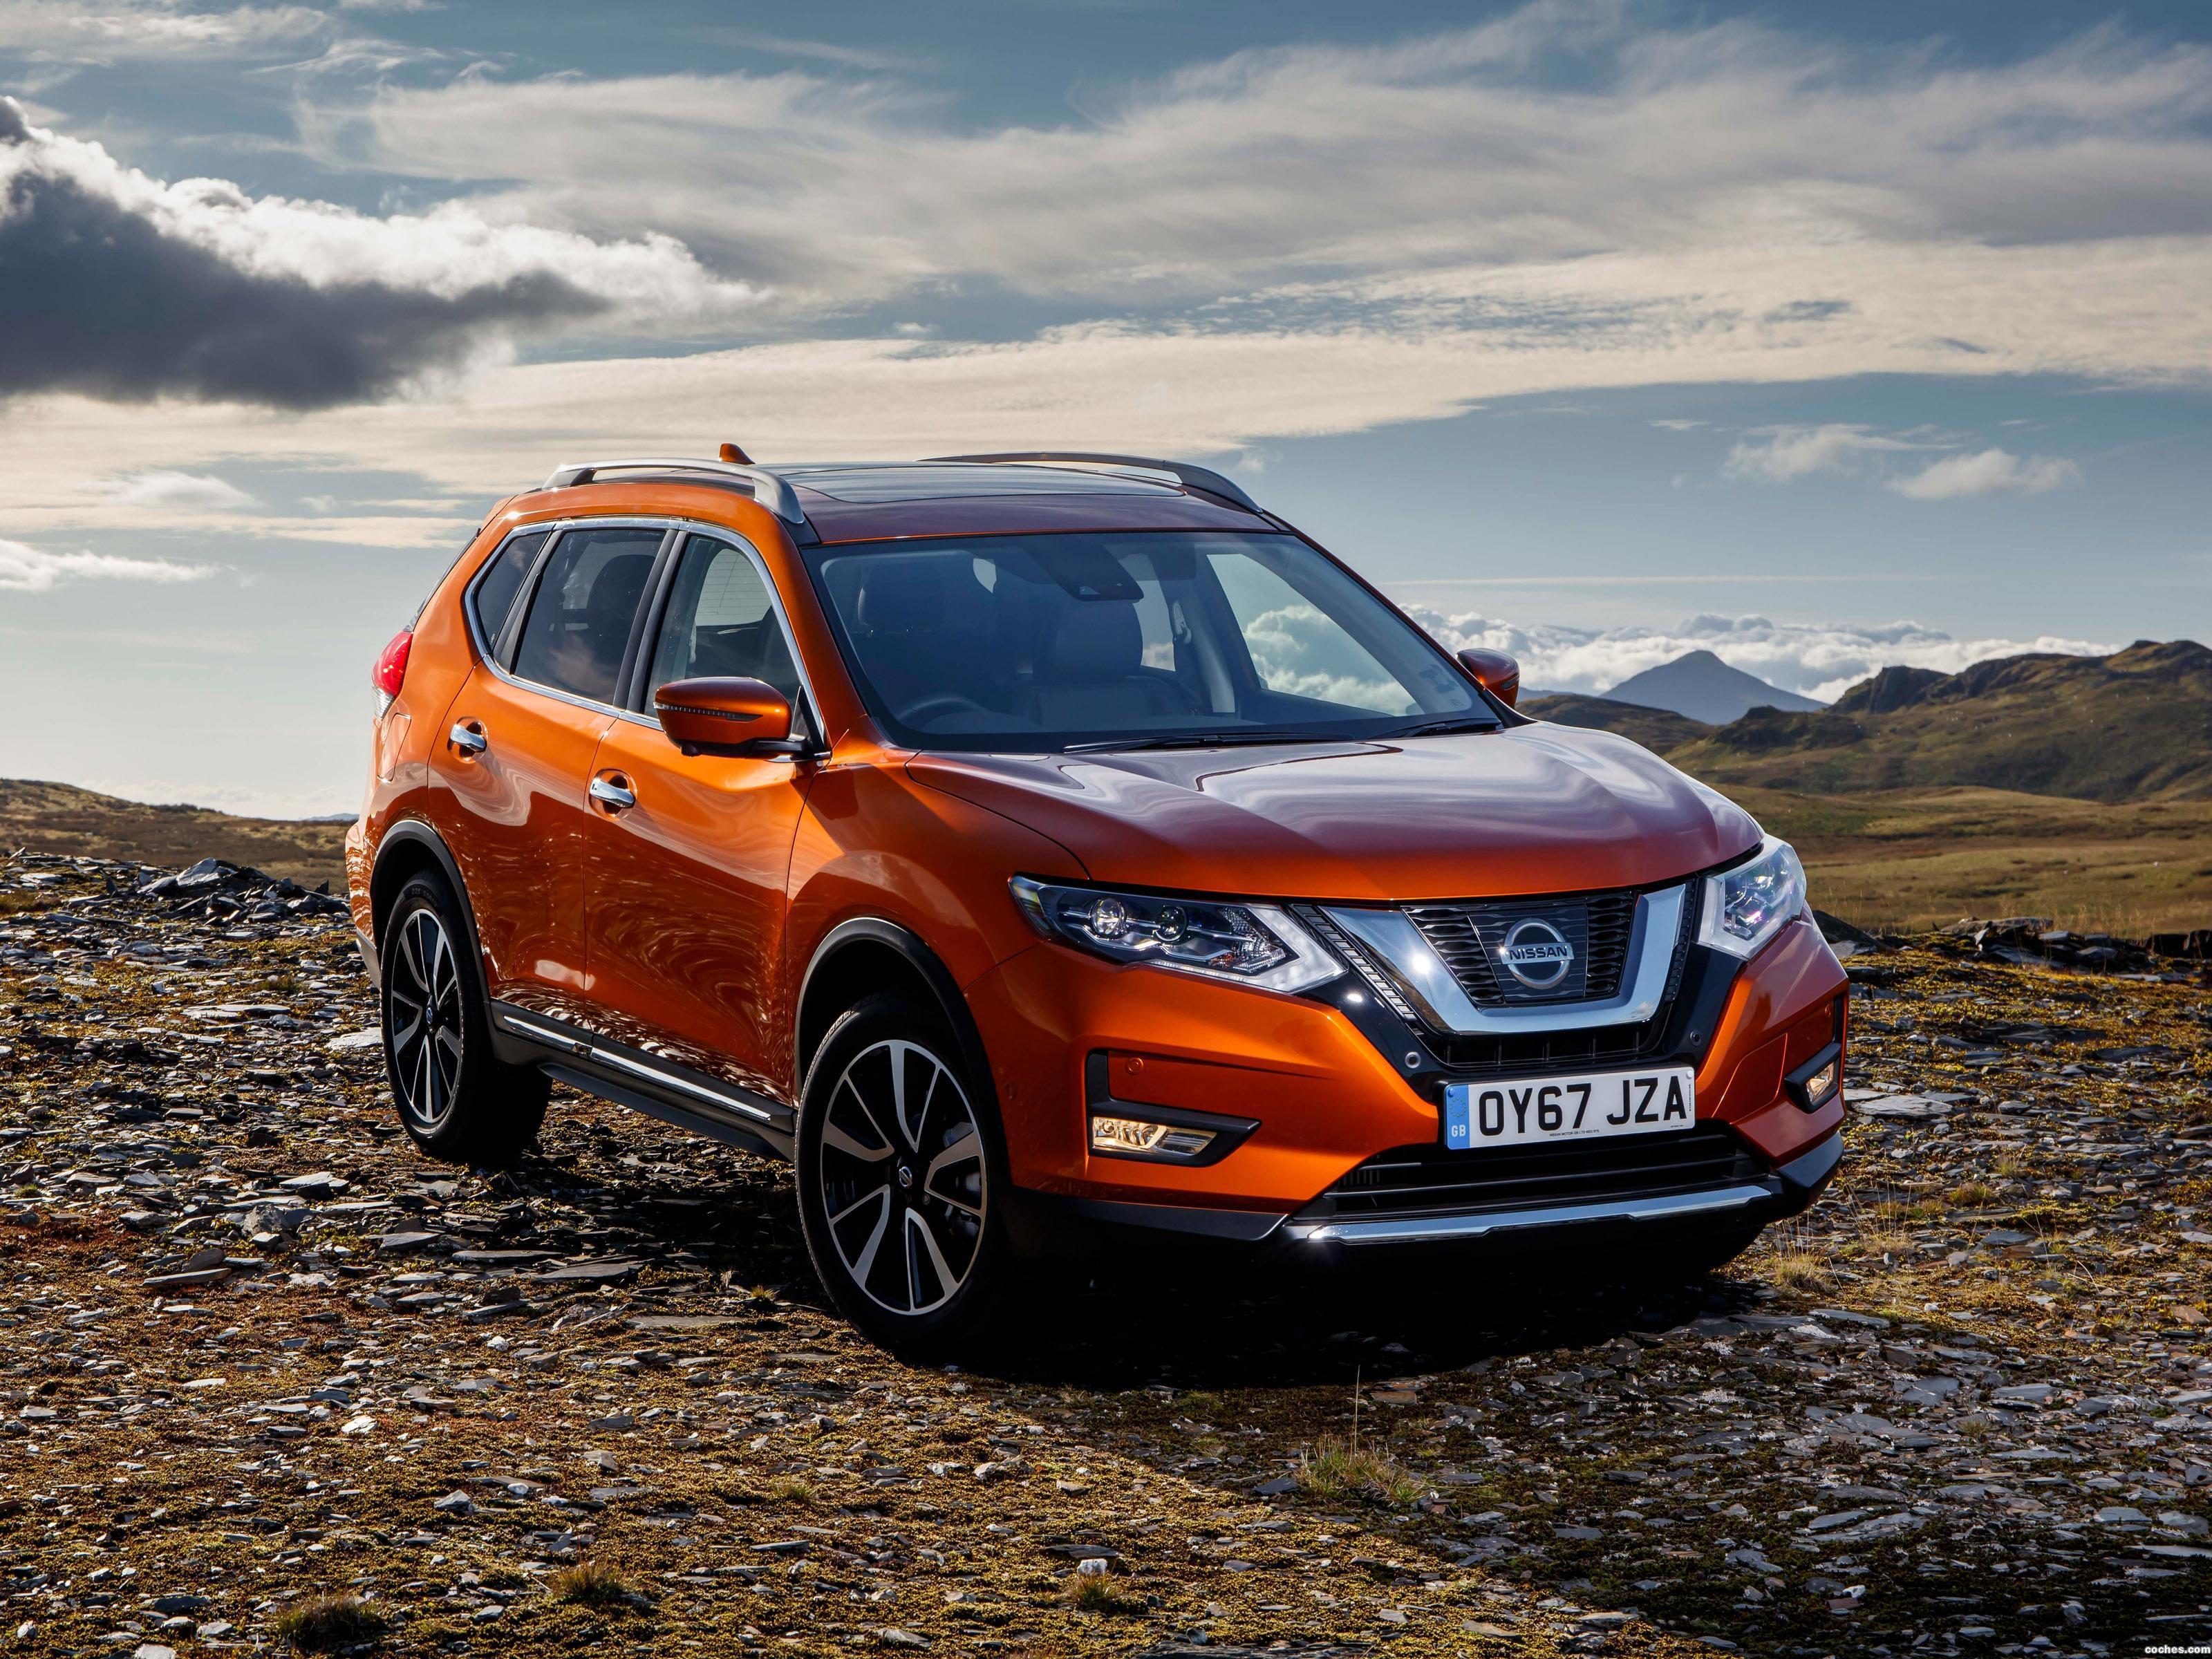 Foto 2 de Nissan X-Trail UK 2017